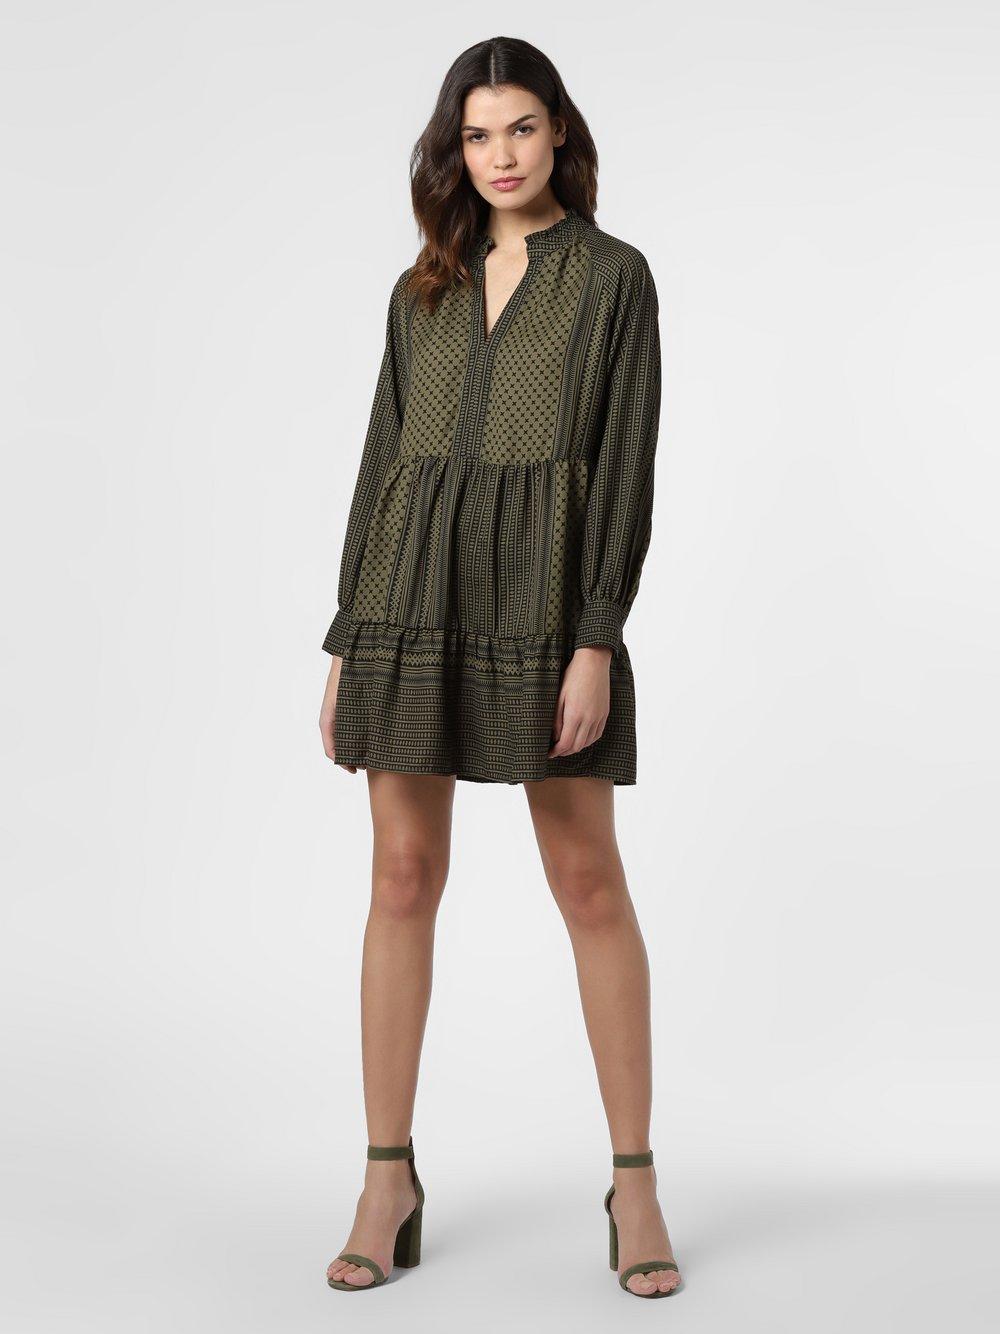 ONLY - Sukienka damska – Onlsoul, zielony